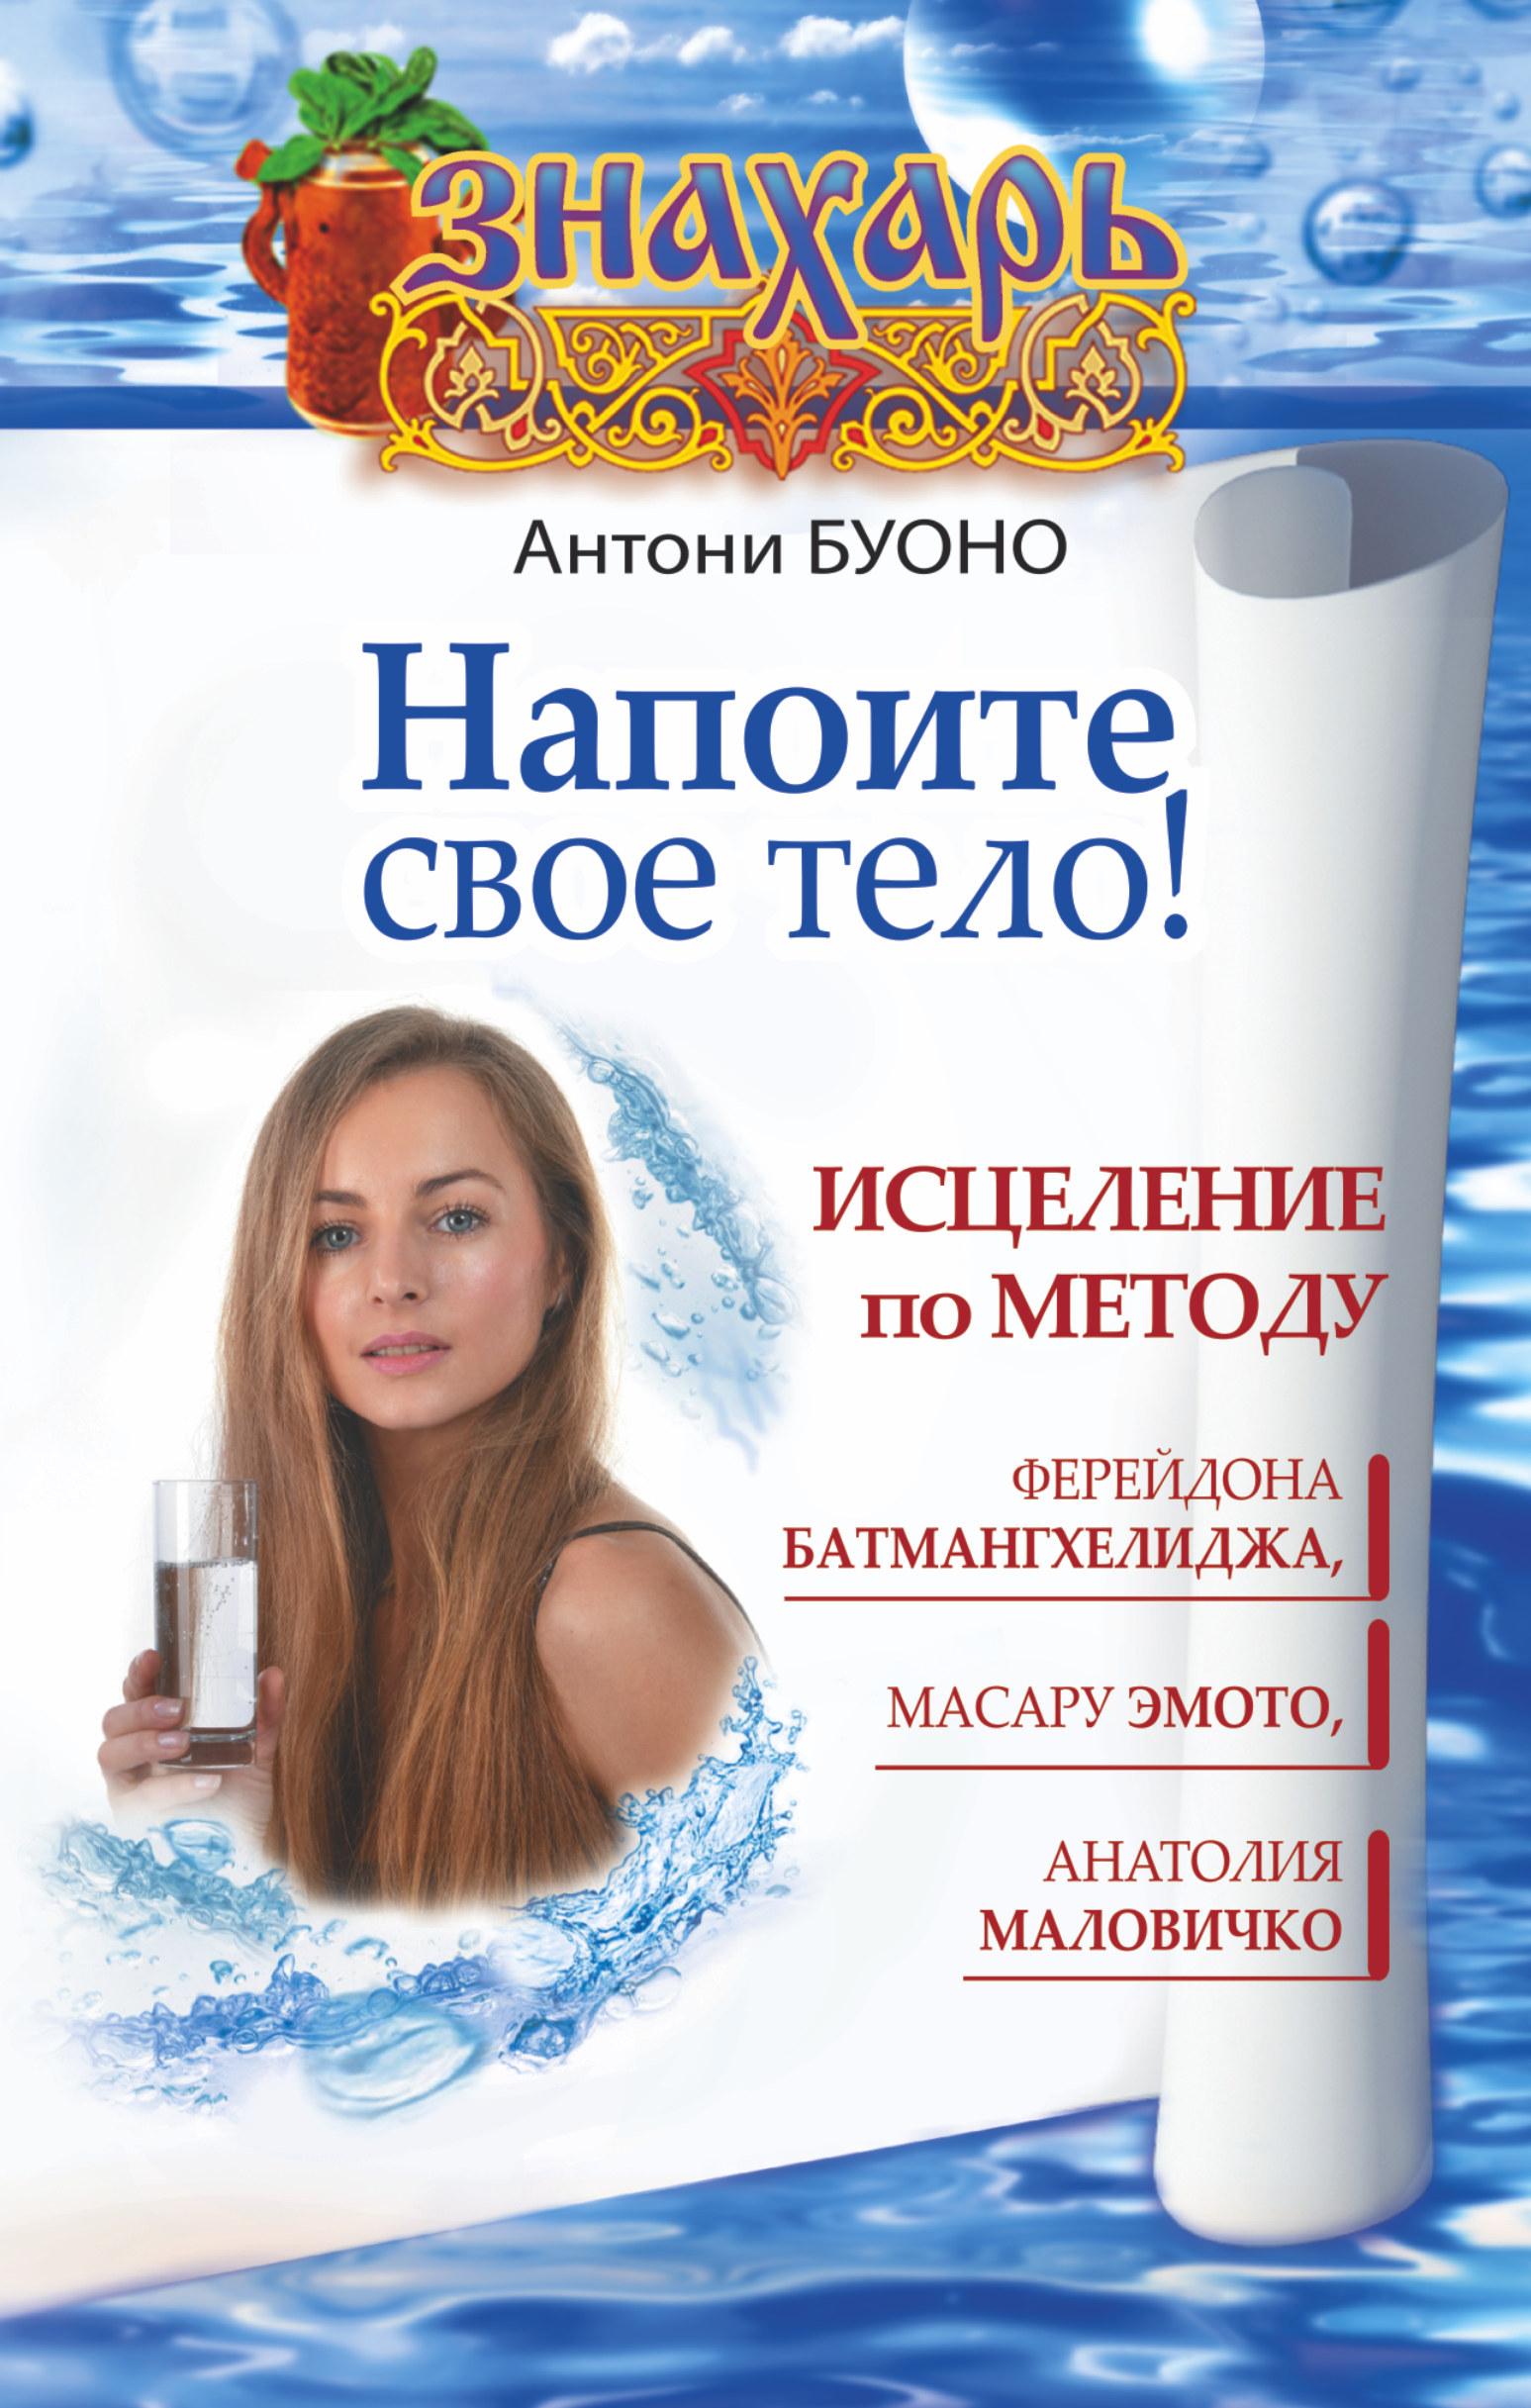 Напоите свое тело! Исцеление по методу Ферейдона Батмангхелиджа, Масару Эмото, Анатолия Маловичко ( Антони Буоно  )